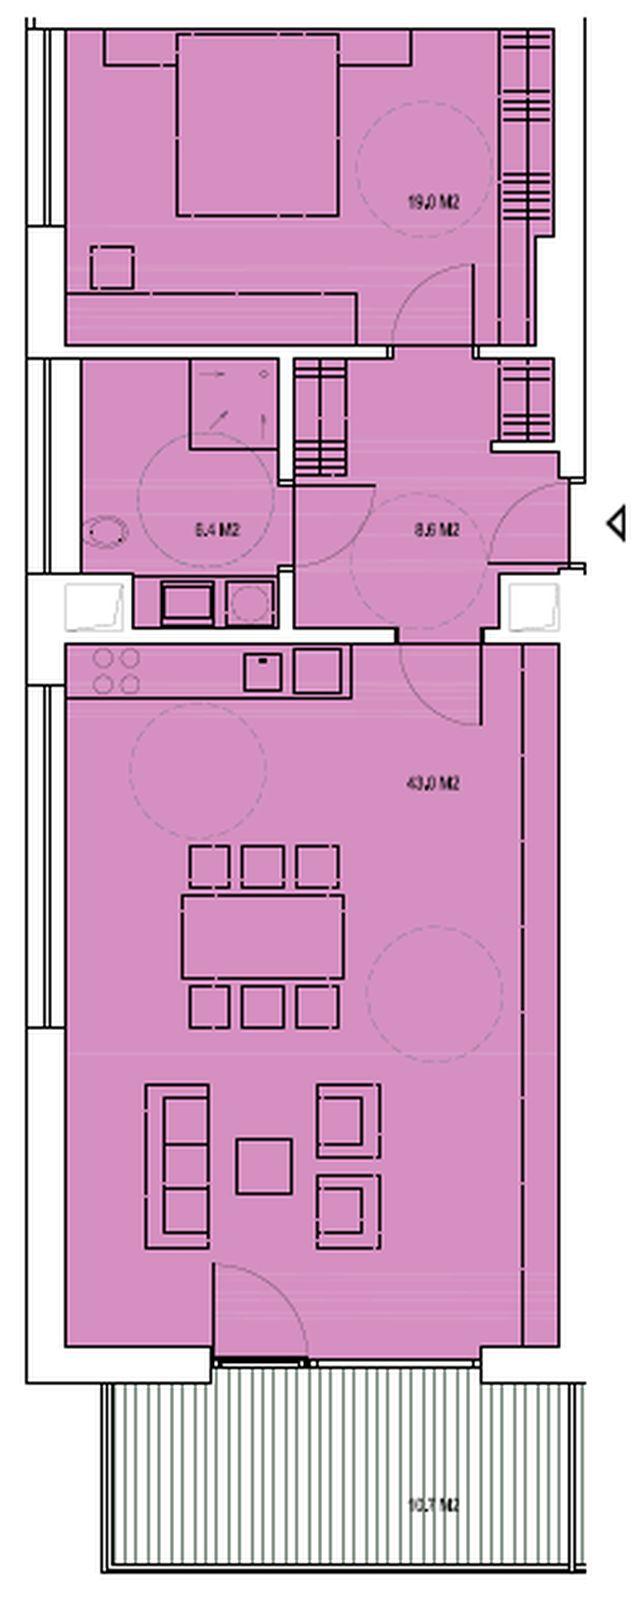 budova B, byt T1 77,1m +balkon